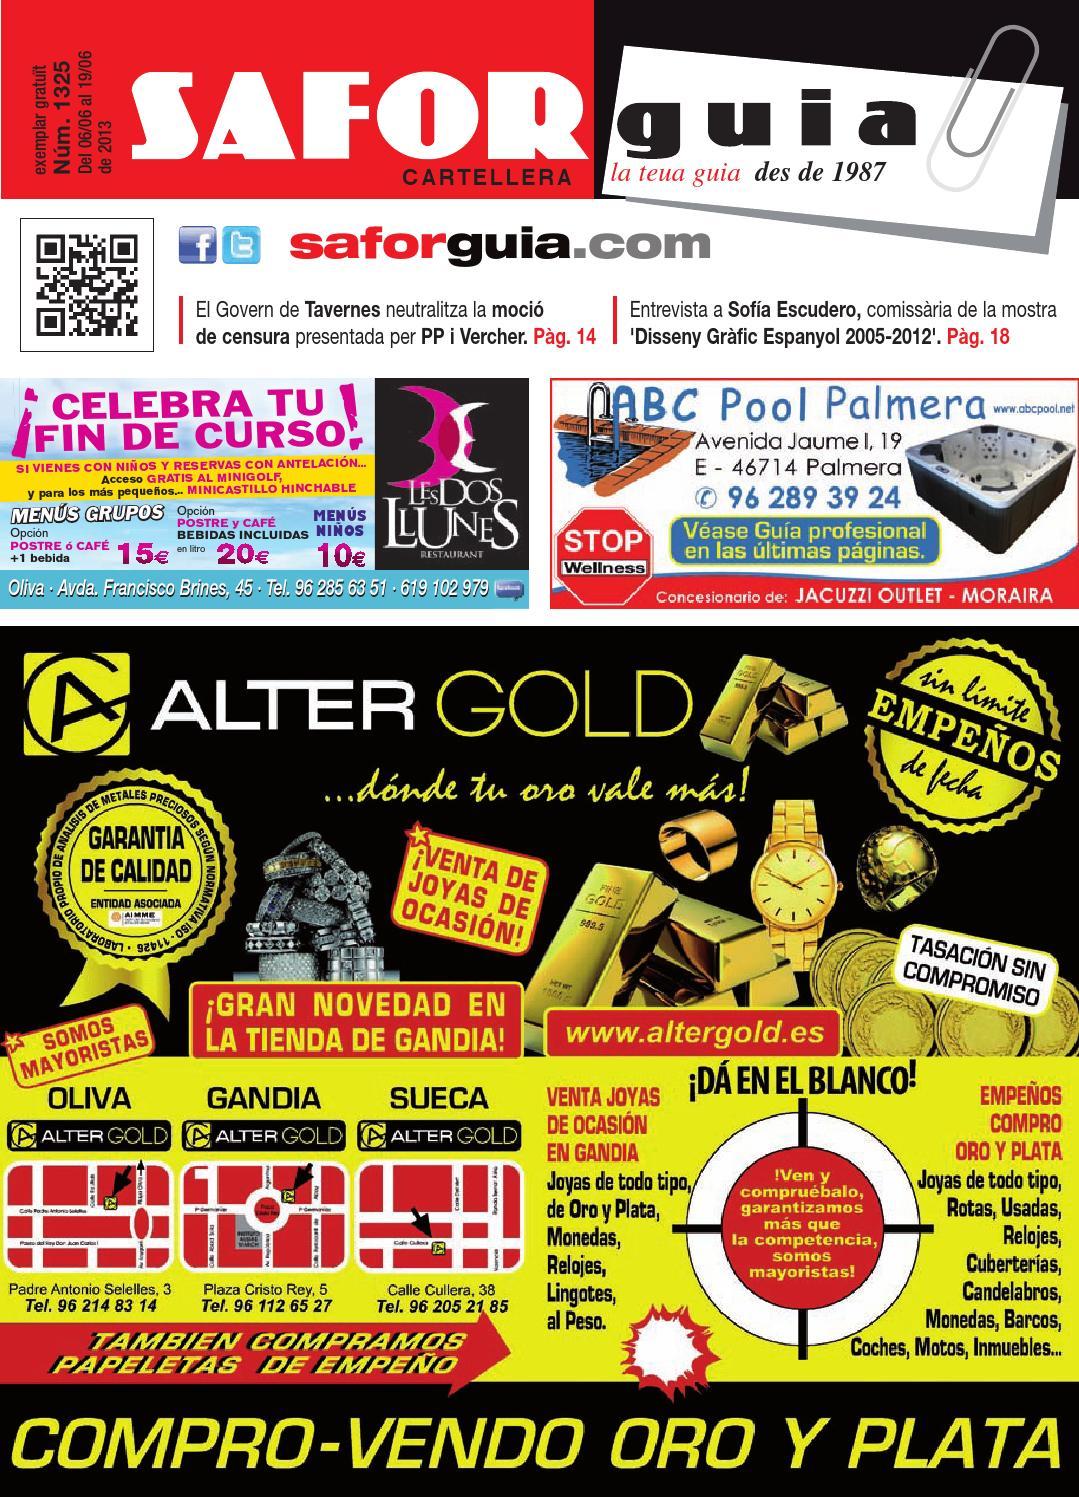 Publicaci N 6 De Junio Al 19 De Junio De 2013 By Saforguia  # Muebles Peiro Quart De Poblet